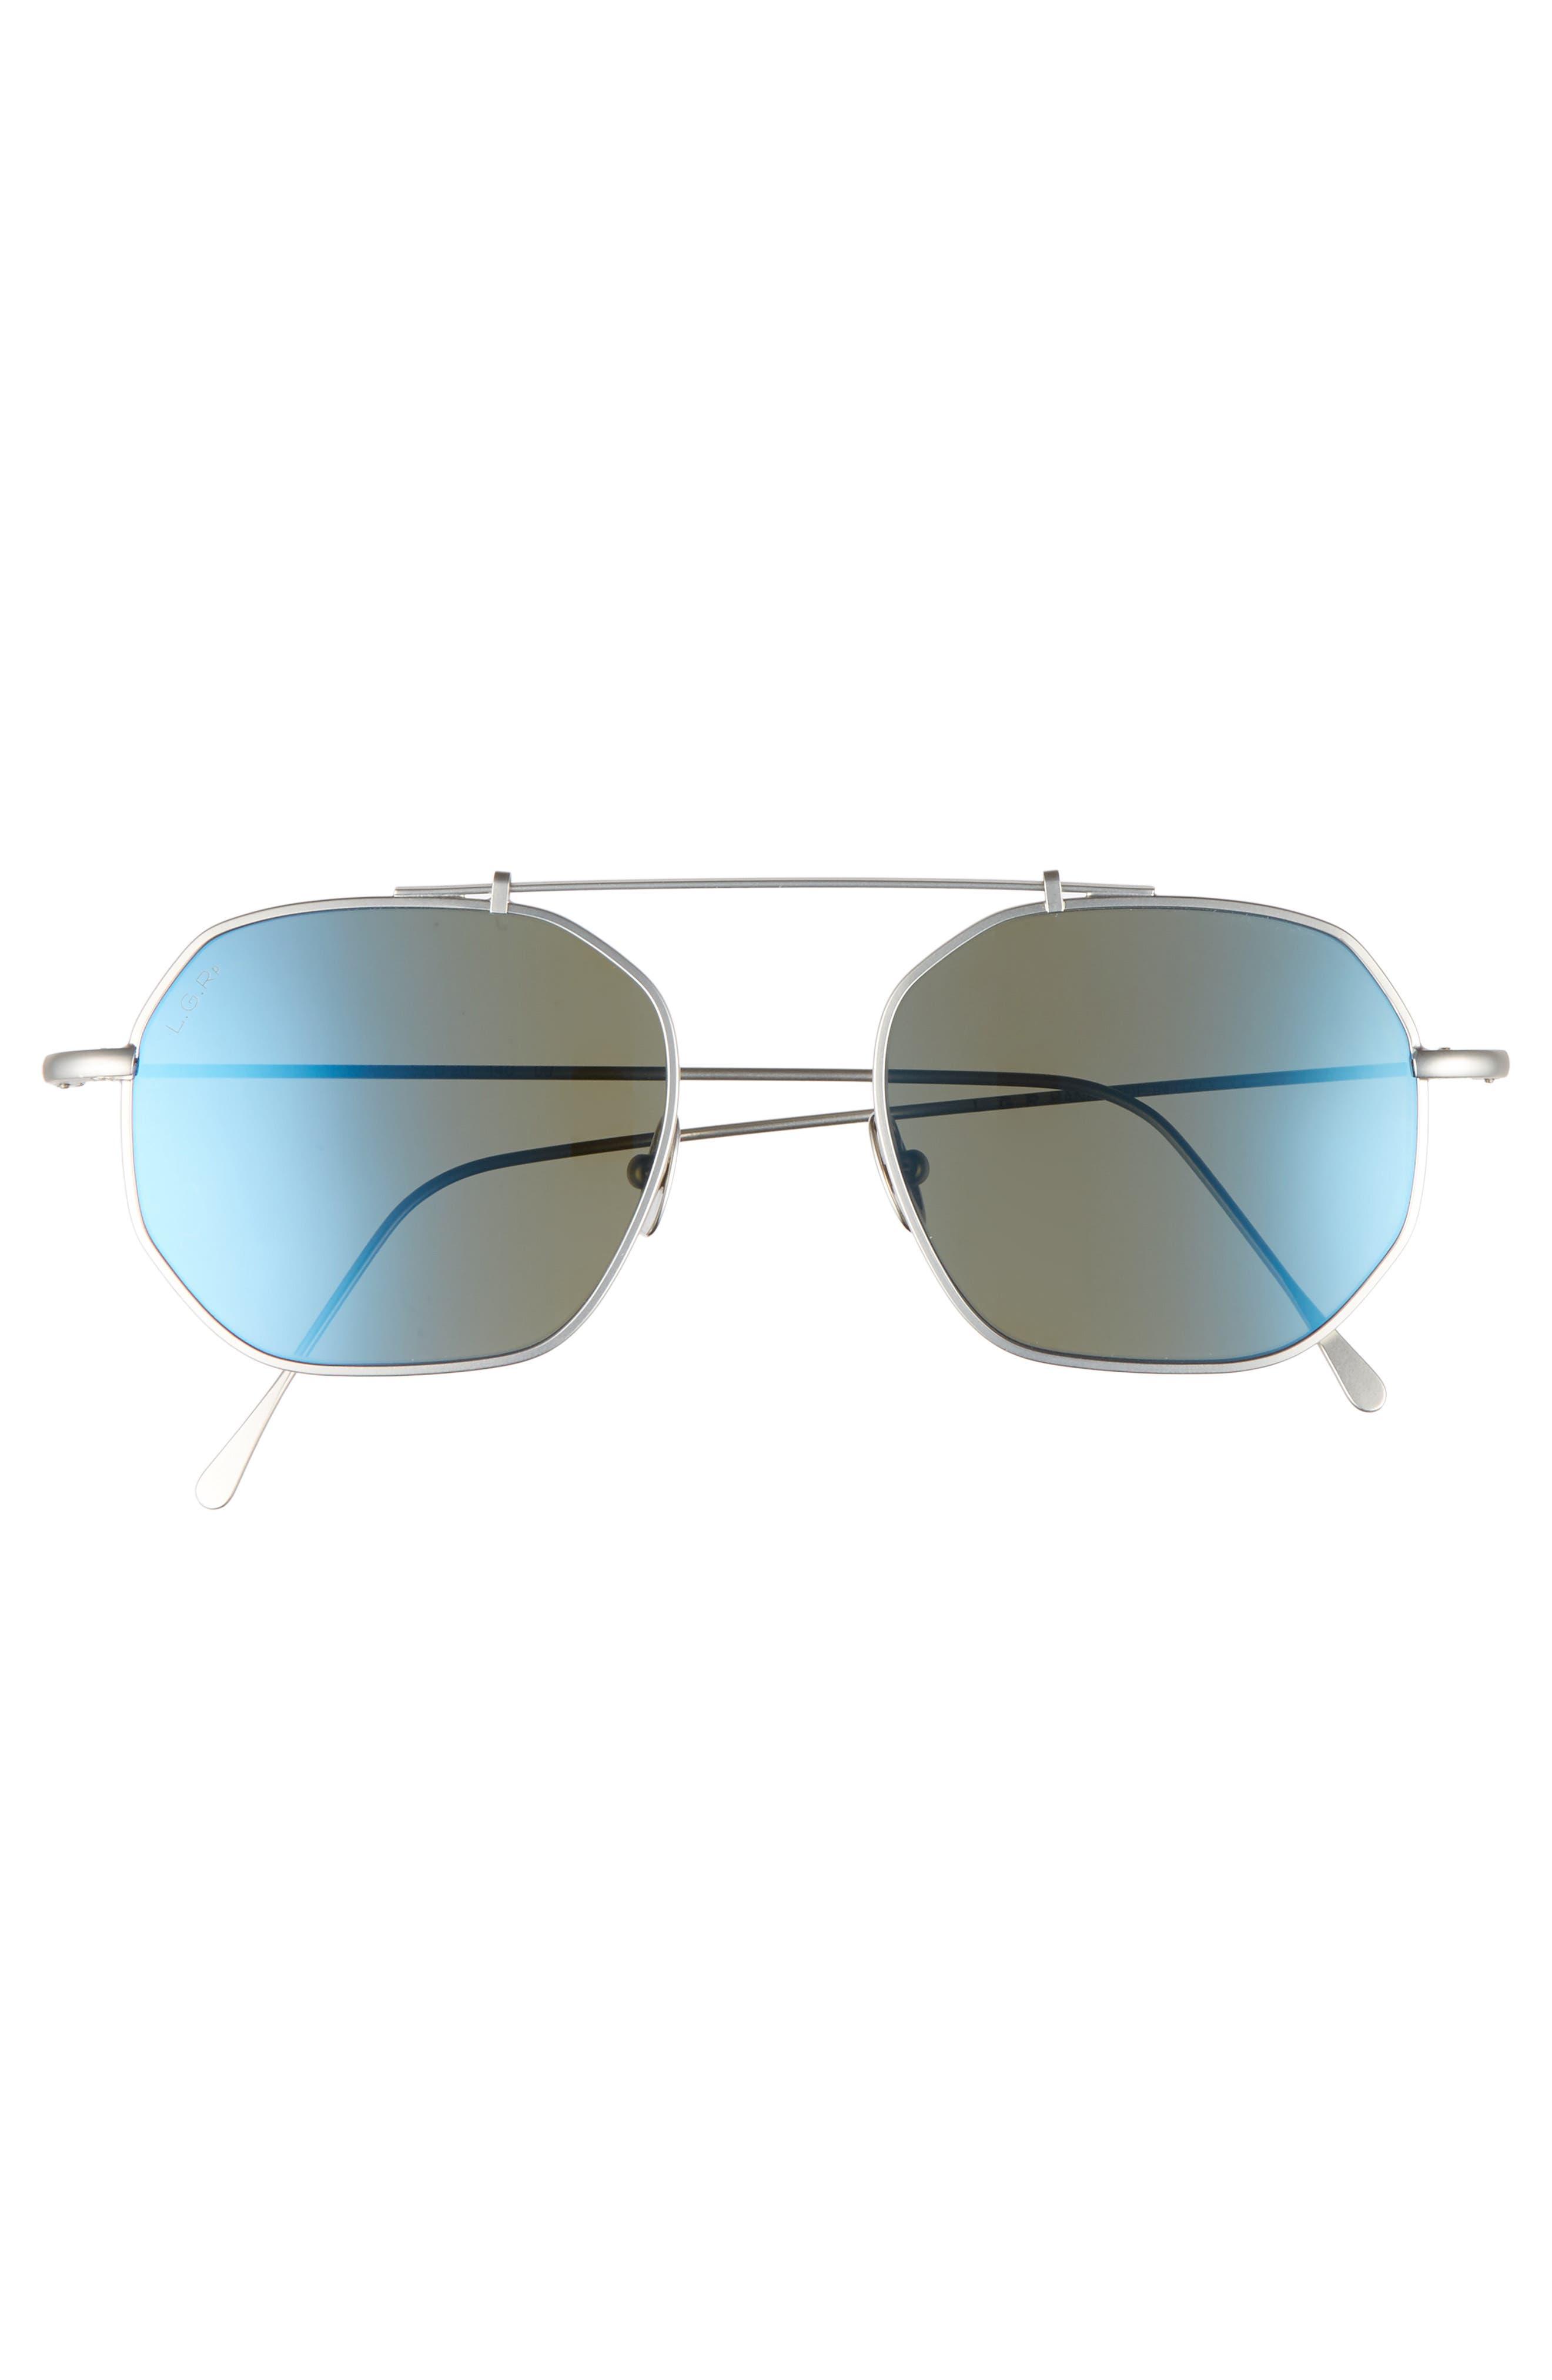 Nomad 52mm Polarized Sunglasses,                             Alternate thumbnail 2, color,                             040